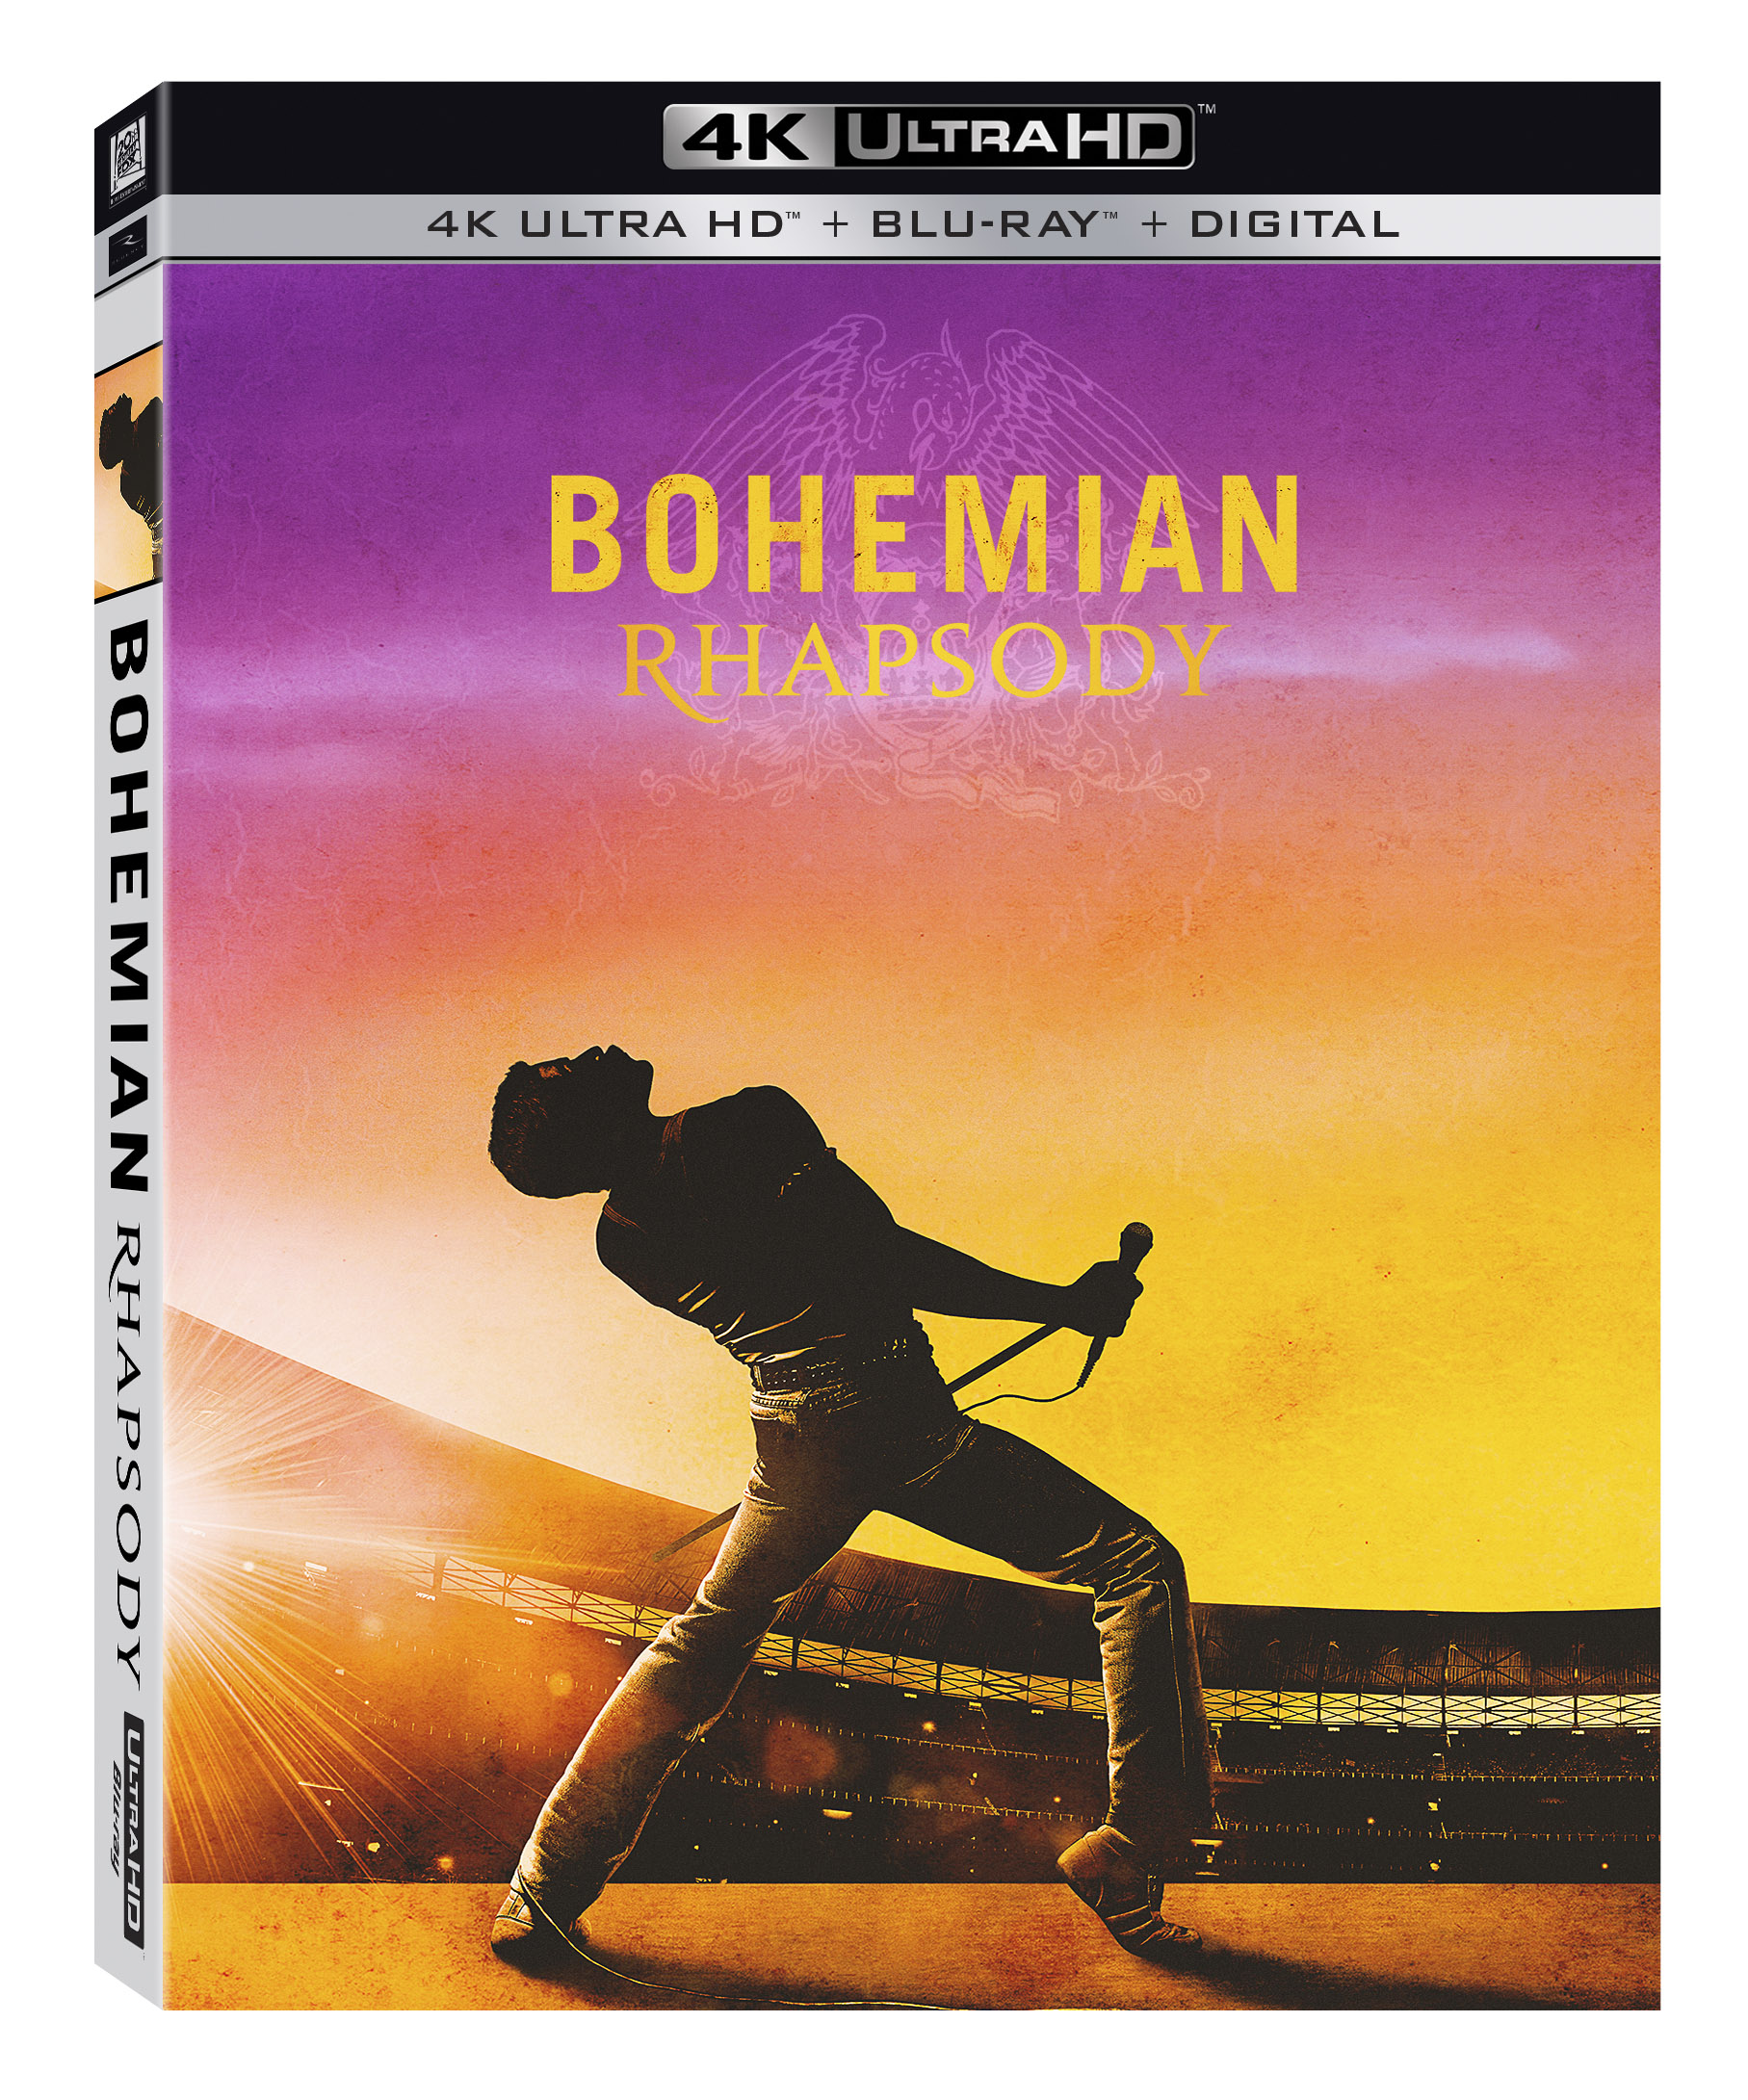 Bohemian Rhapsody 4k Ultra Hd Blu Ray Digital Copy Walmart Com